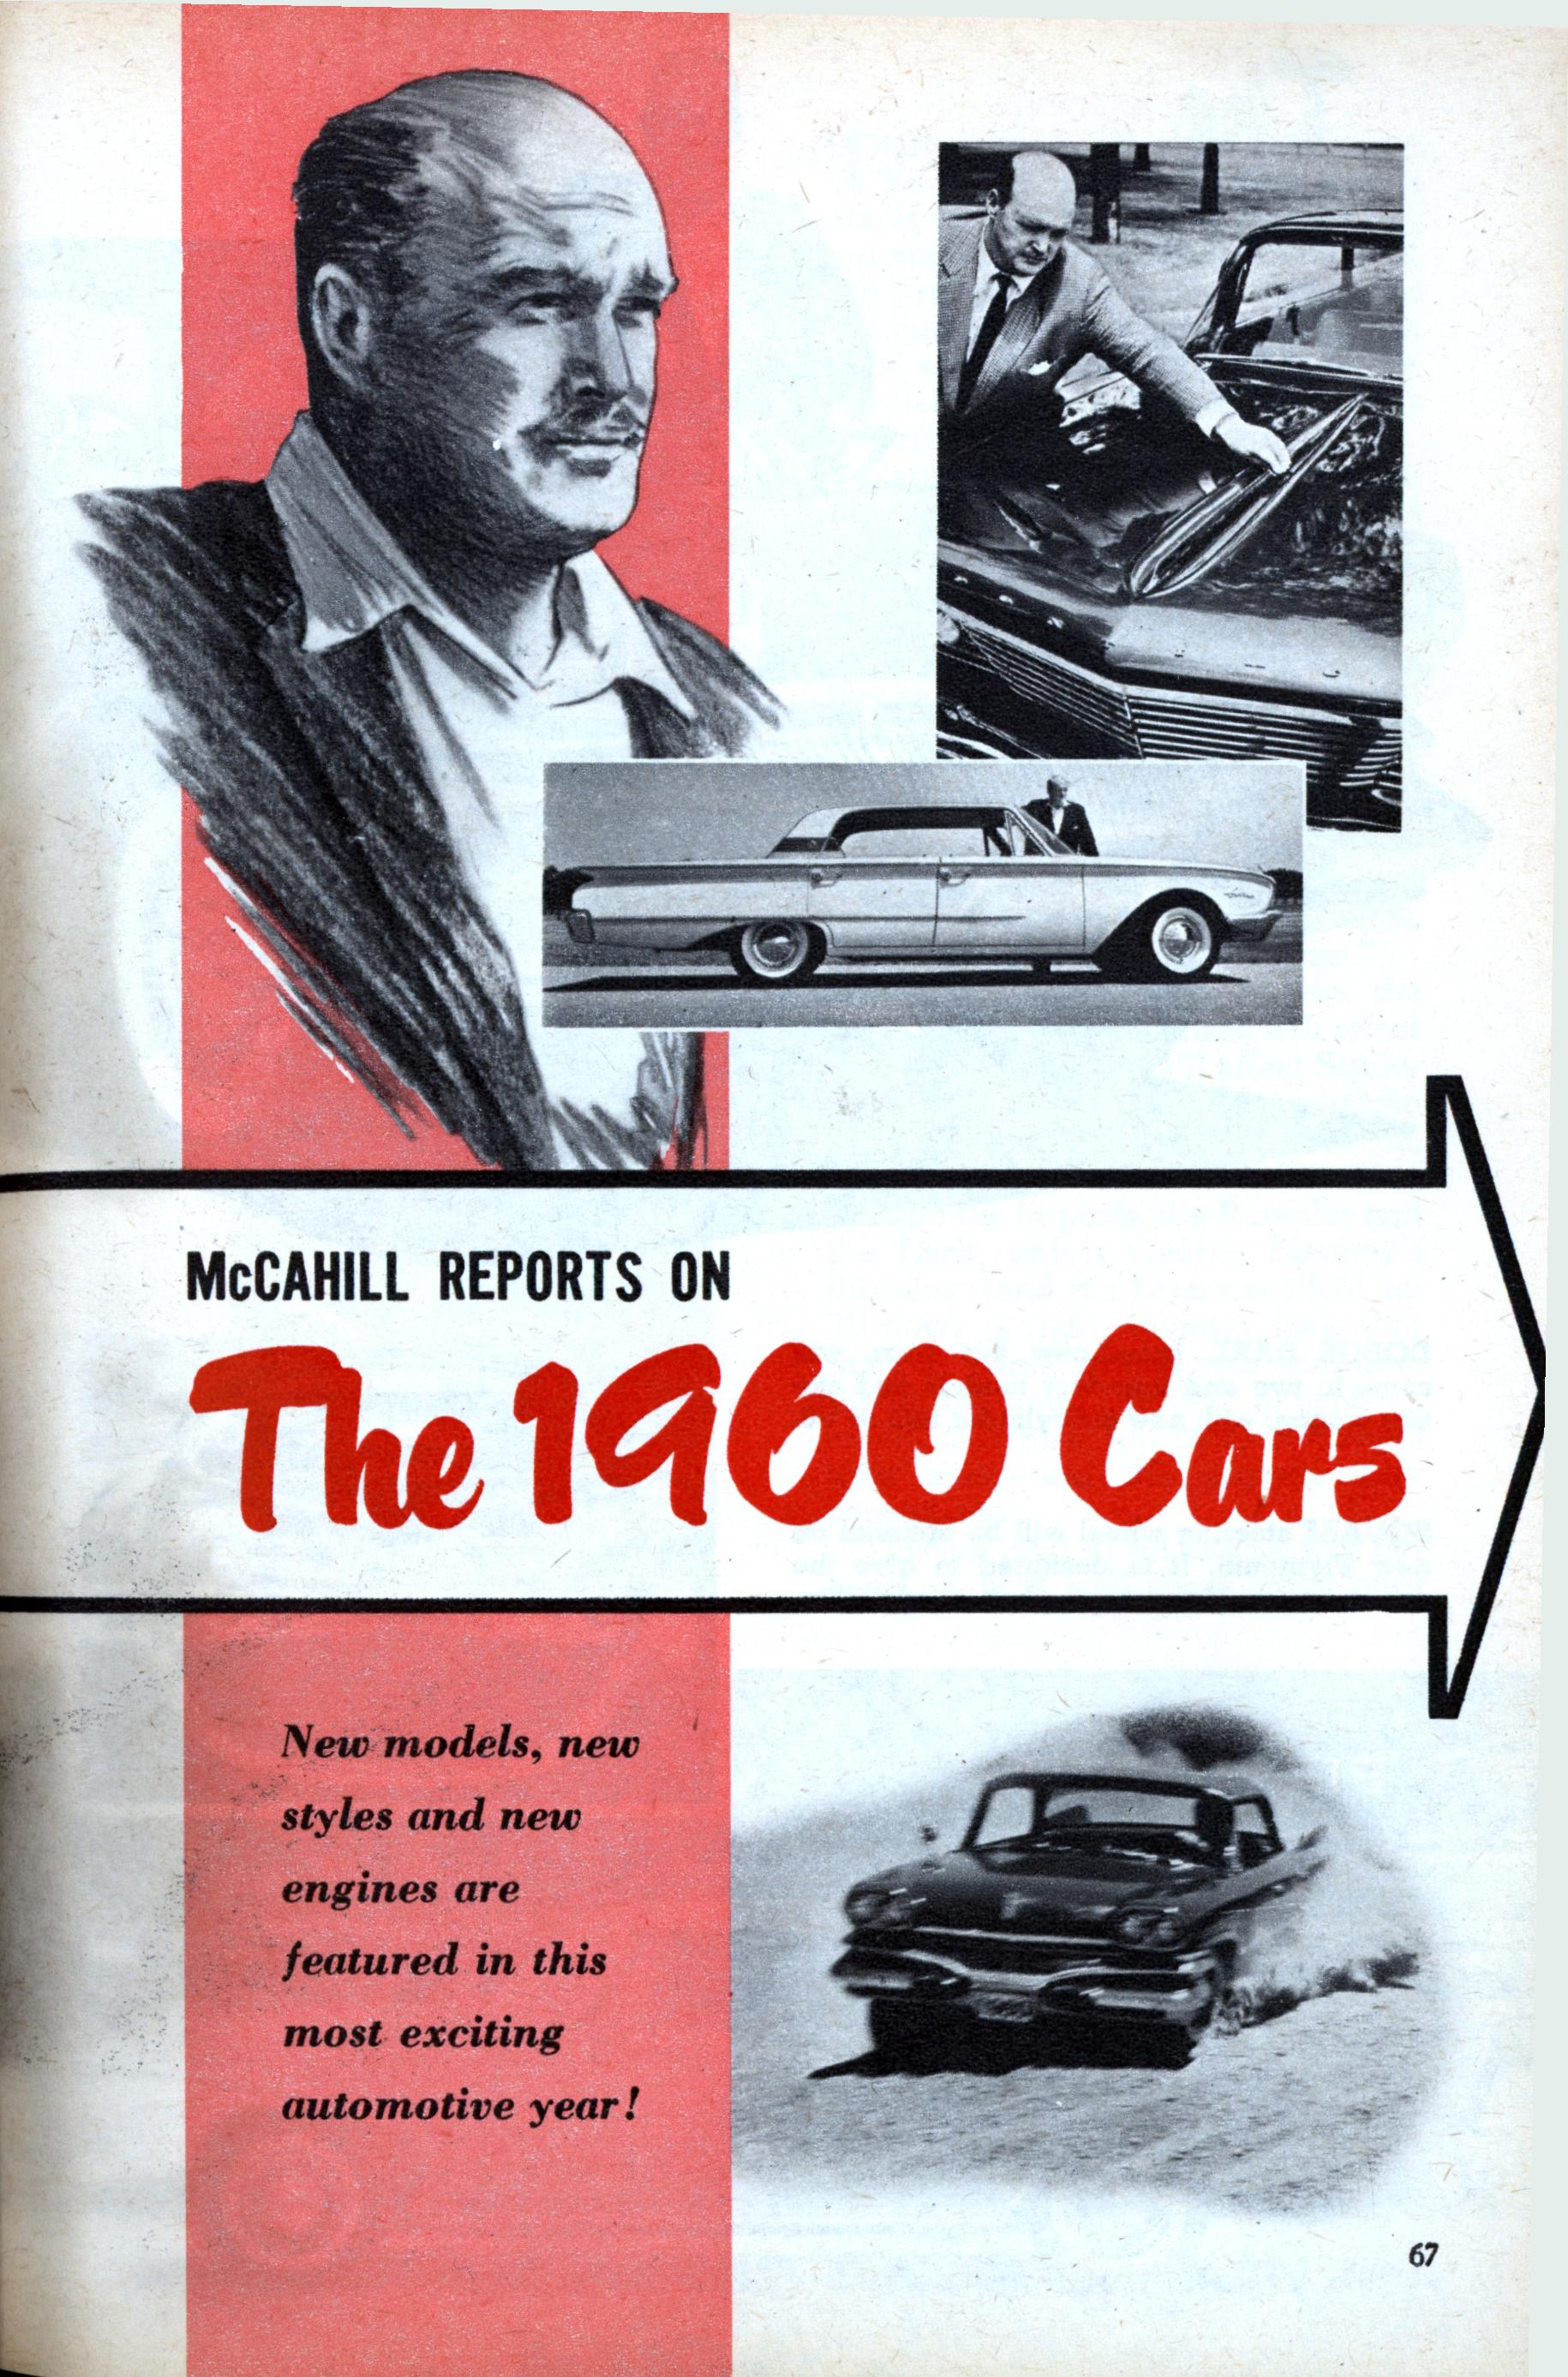 The 1960 Cars (Nov, 1959)